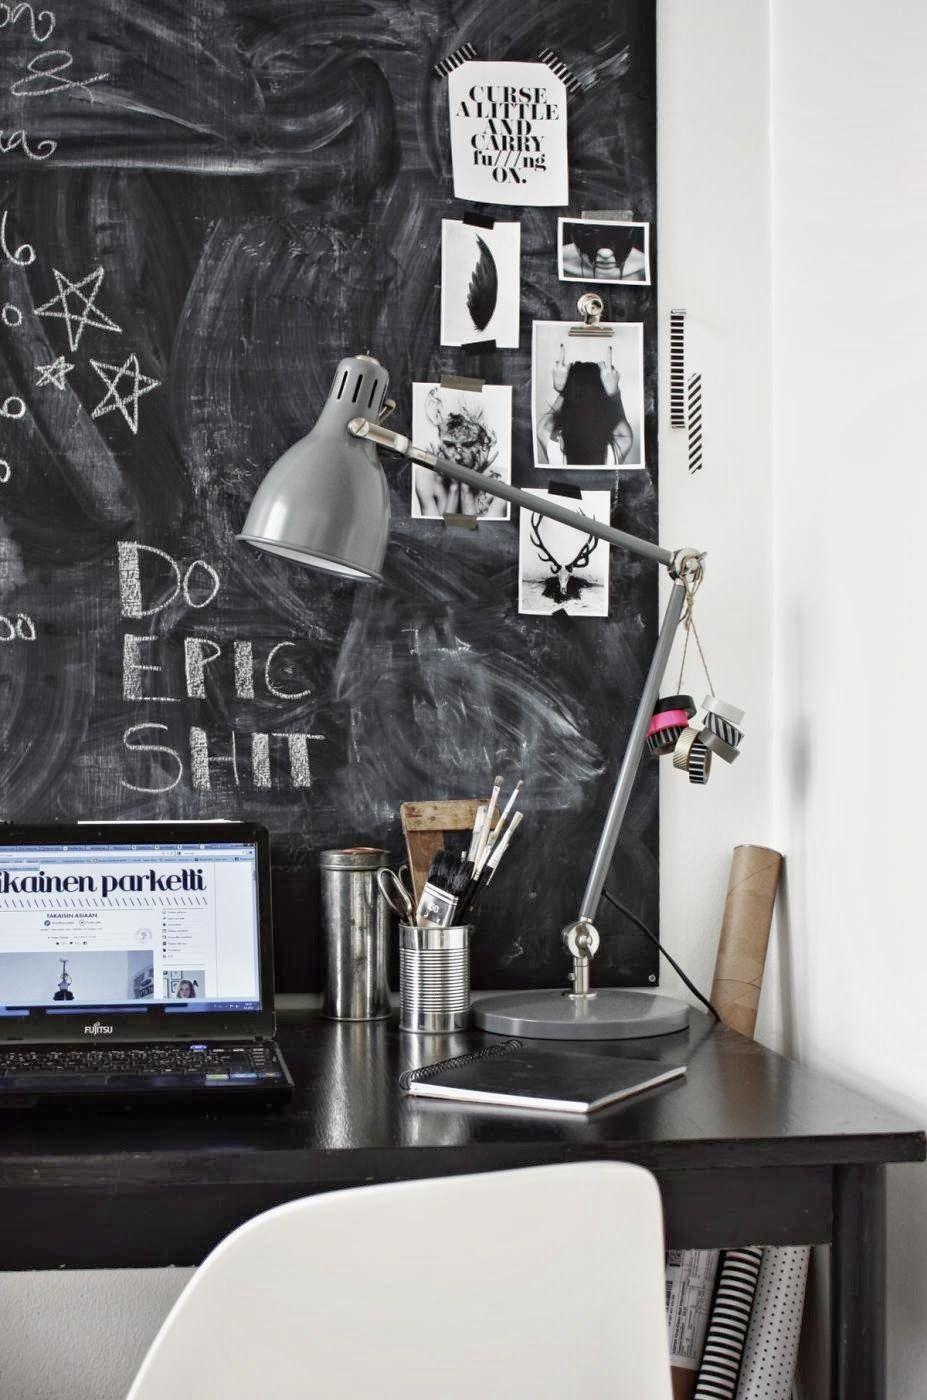 Pin by michelle wooderson on chalkboard pinterest workspaces